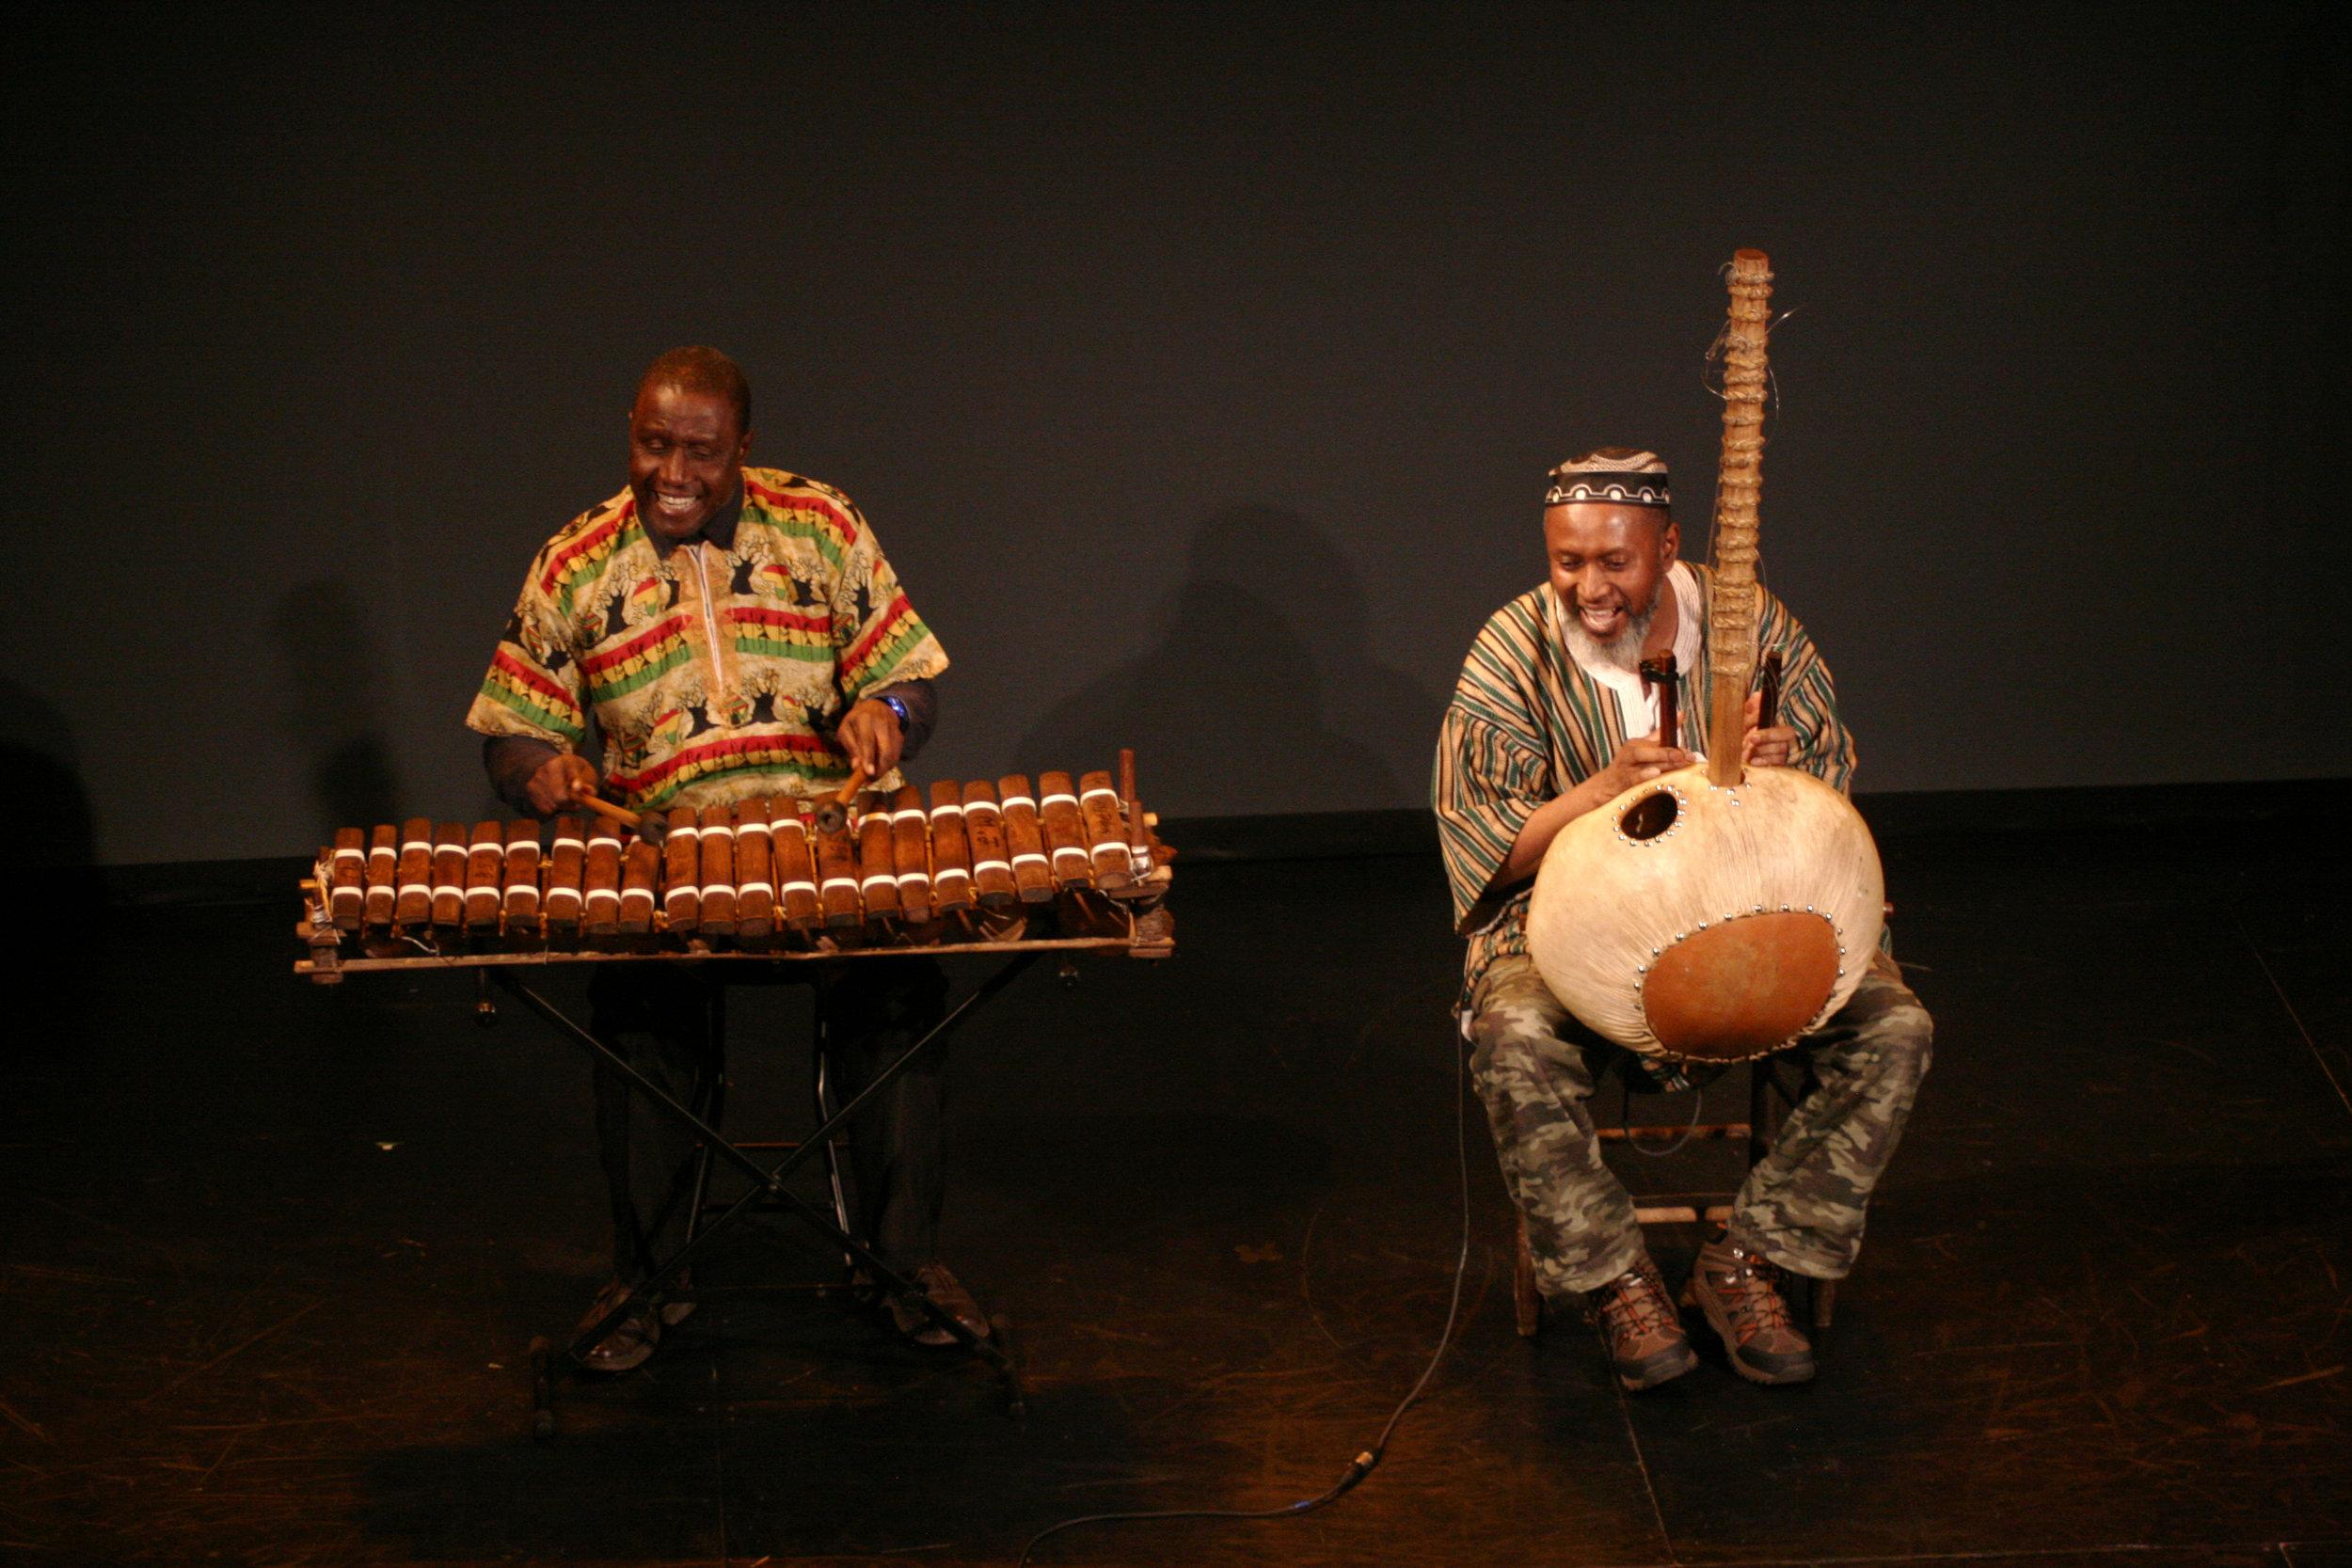 West African musicians Ebrima Jassey (Balafon) and Salieu Suso (Kora).Photo by Elisa Gutierrez